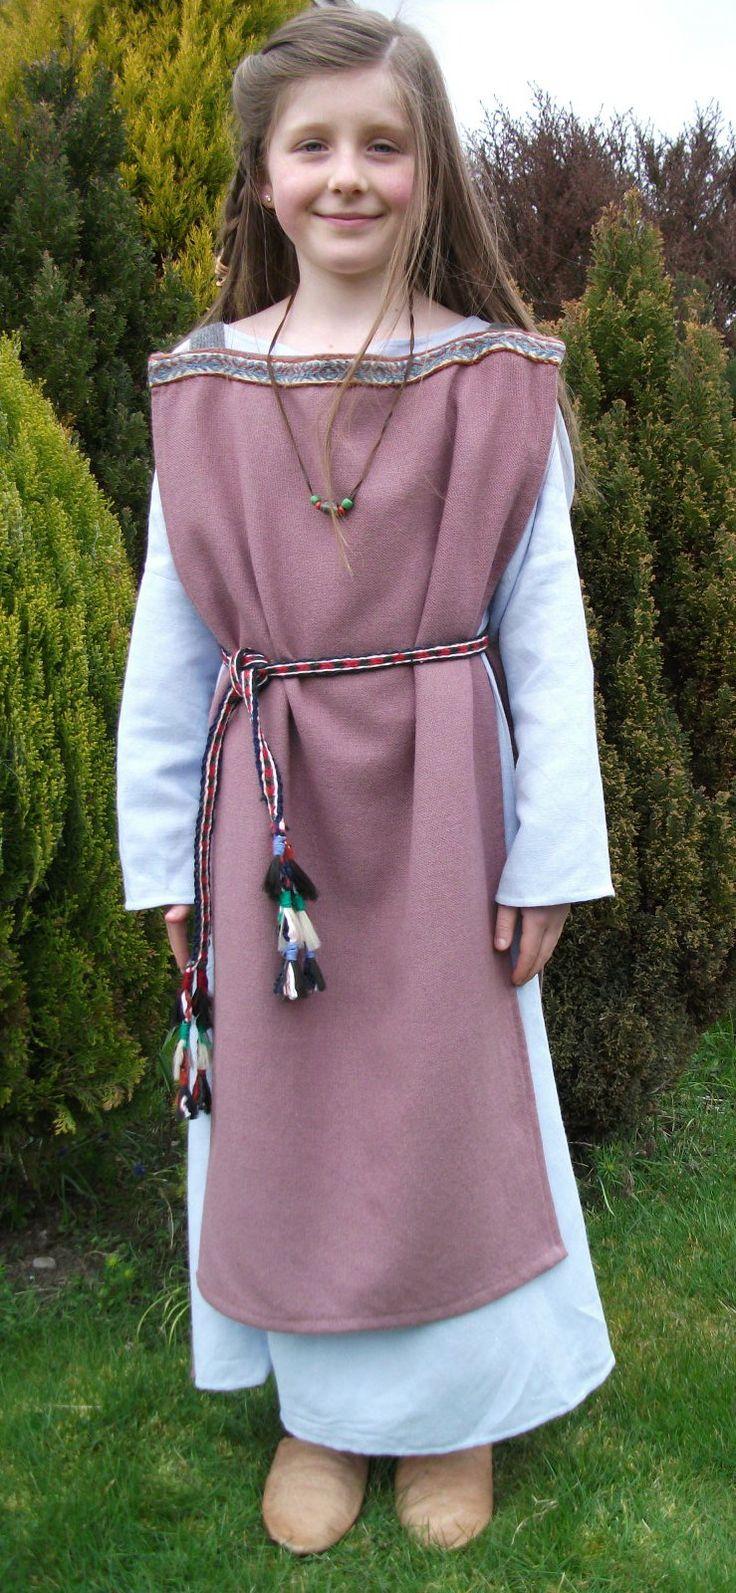 Viking Girlsu0026#39; dress http//www.history-explorer.co.uk/replicas/product_viking_apron_dress.jpg ...